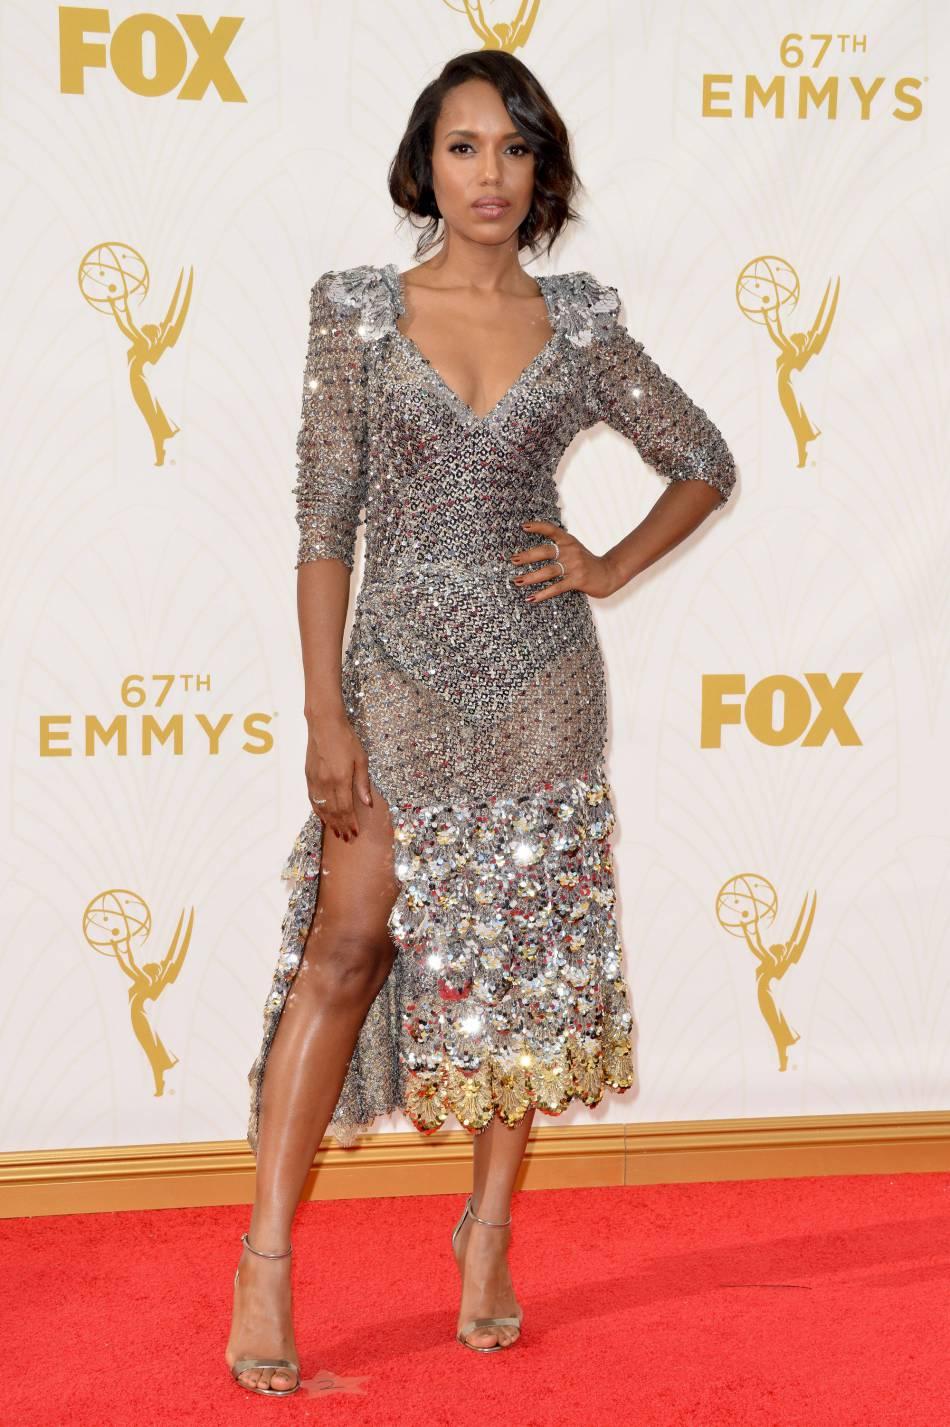 Kerry Washington En Robe Marc Jacobs Lors De Emmy Awards 2015 Puretrend